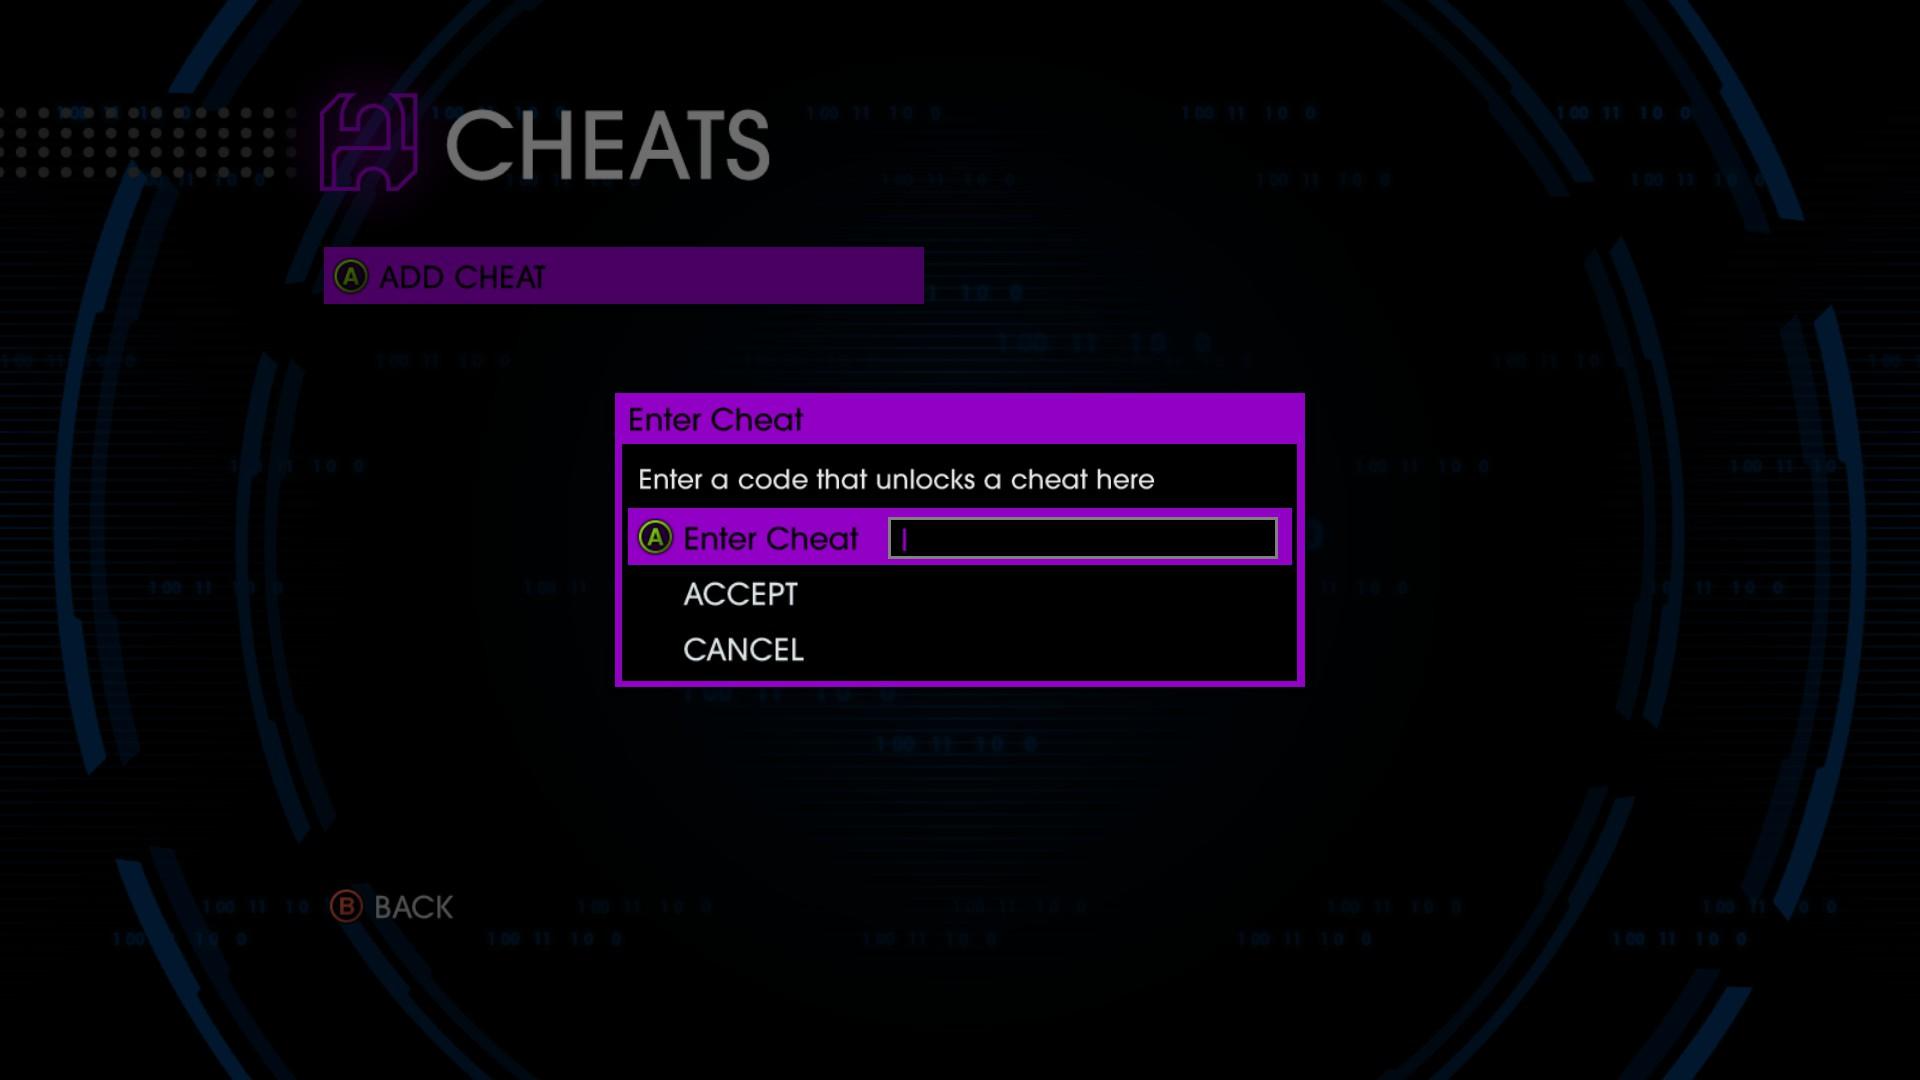 Saints Row 4 Guide Cheat Codes List